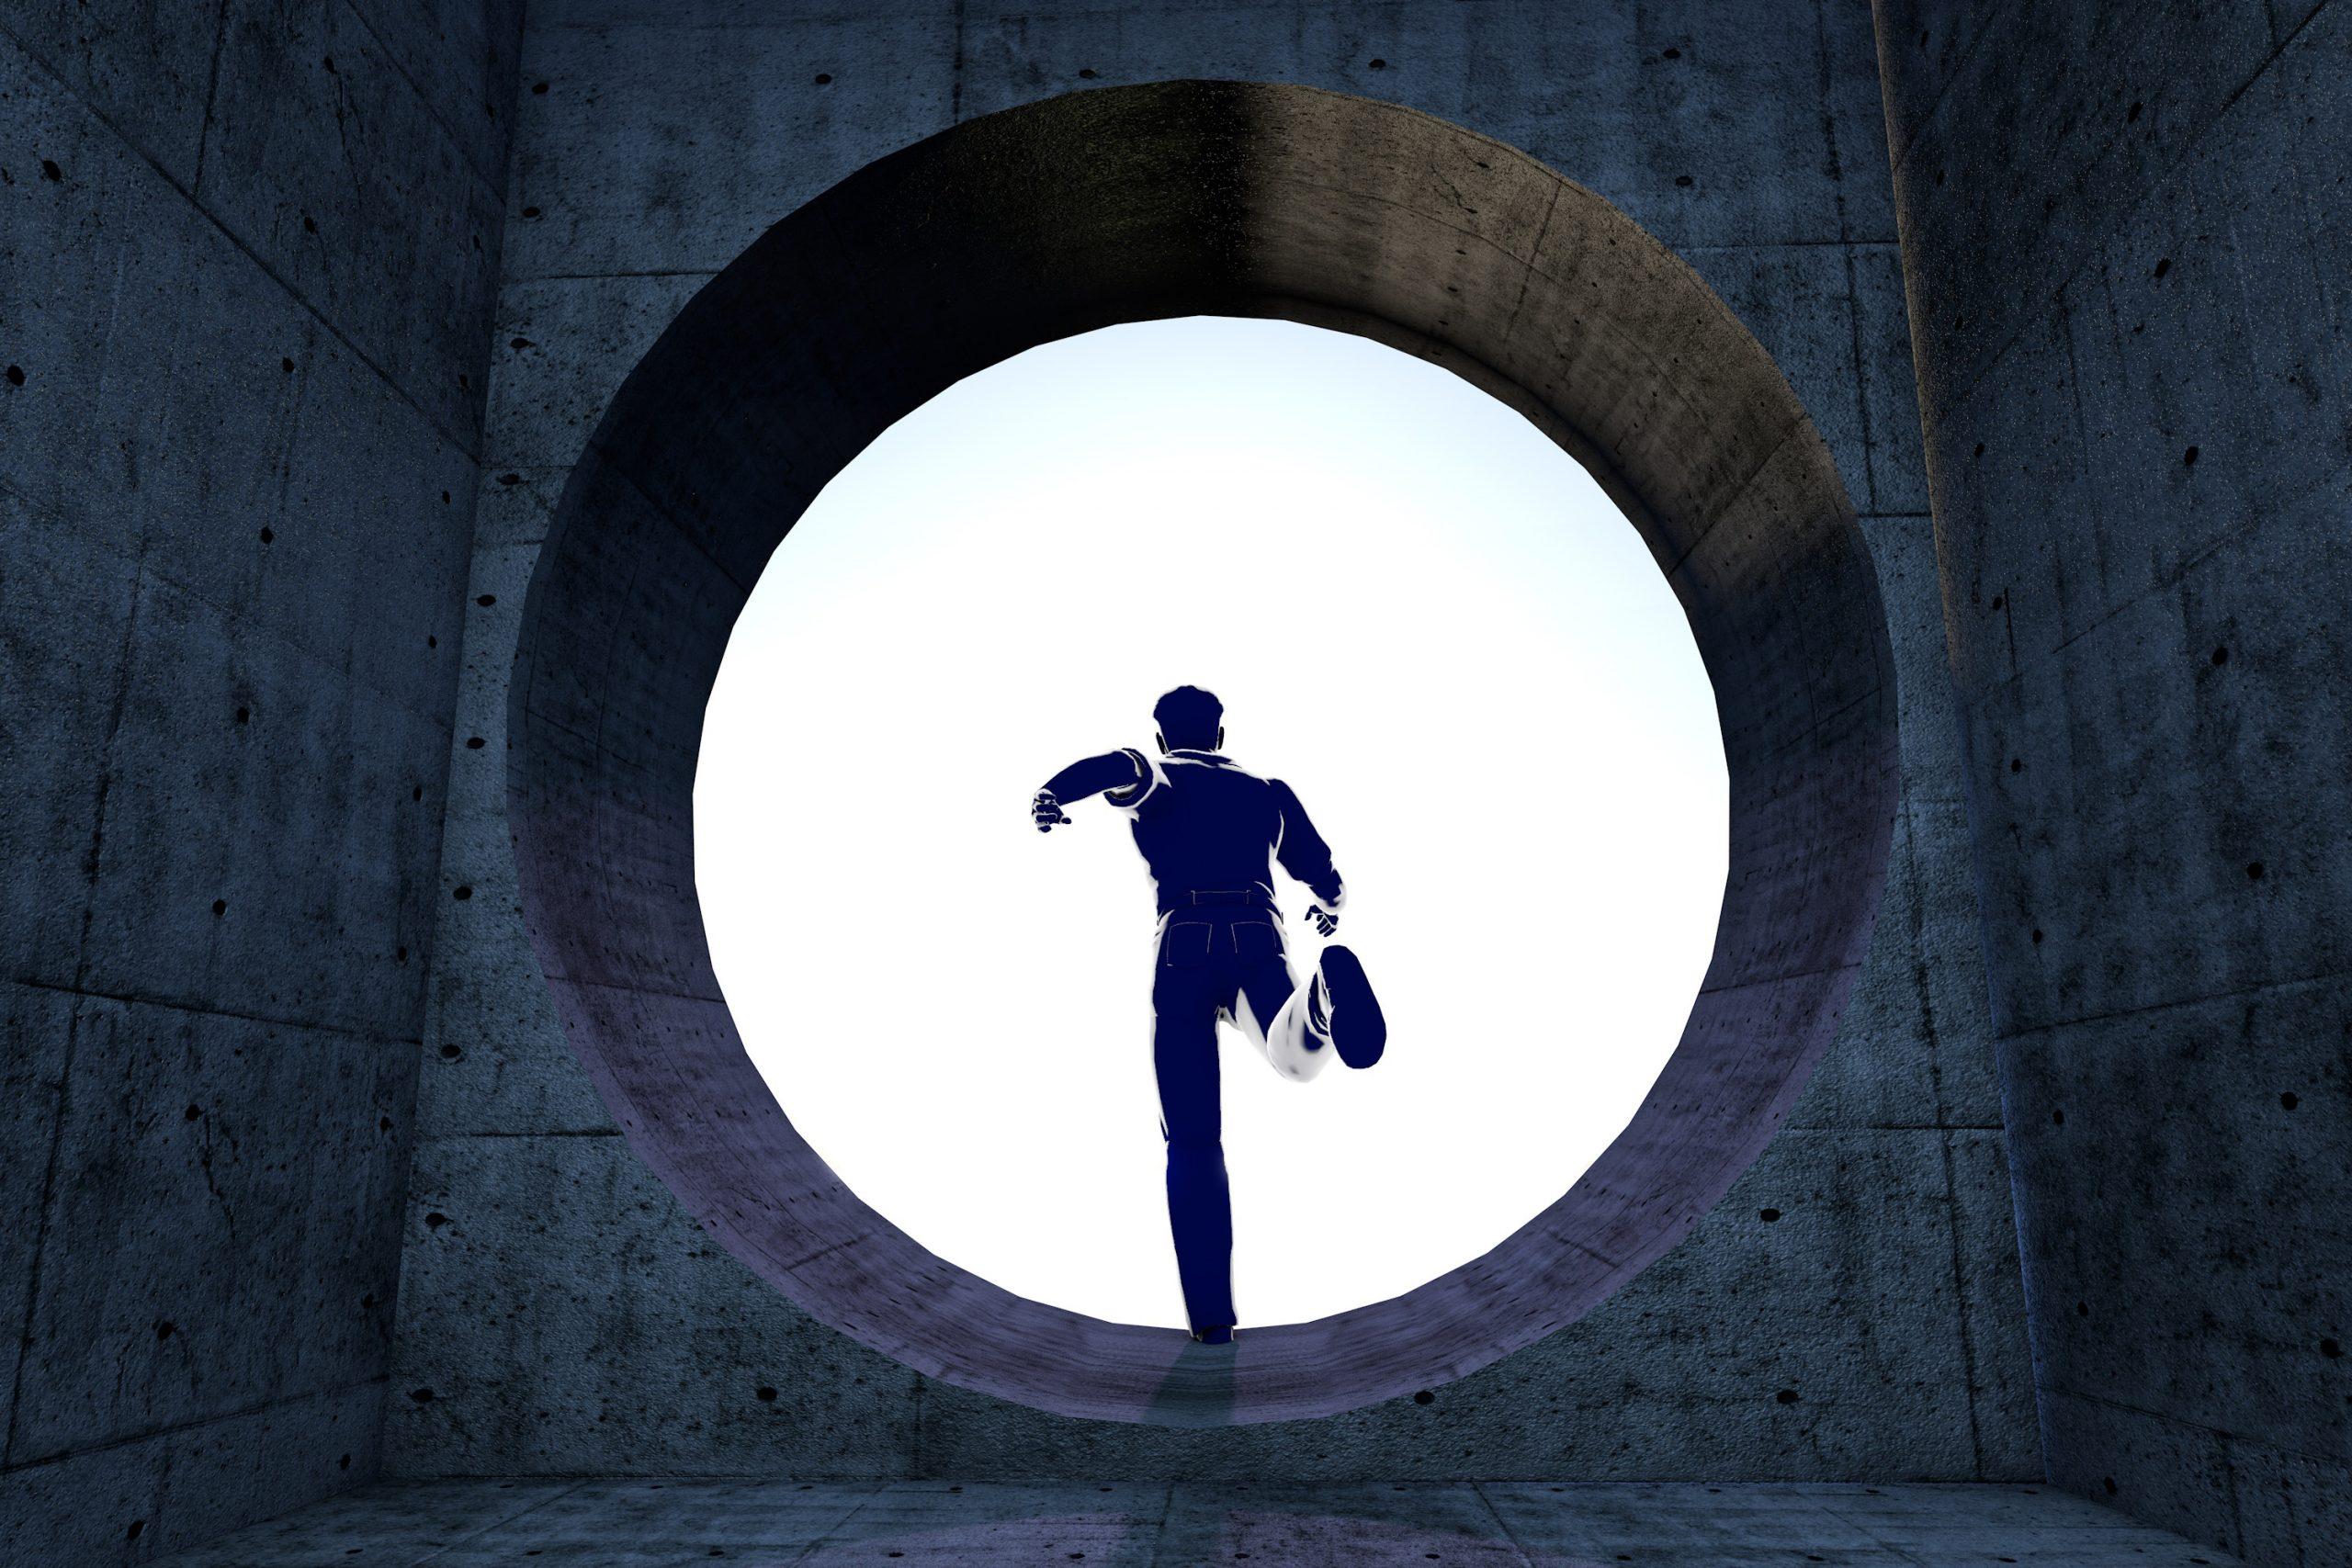 man running trough round window opening